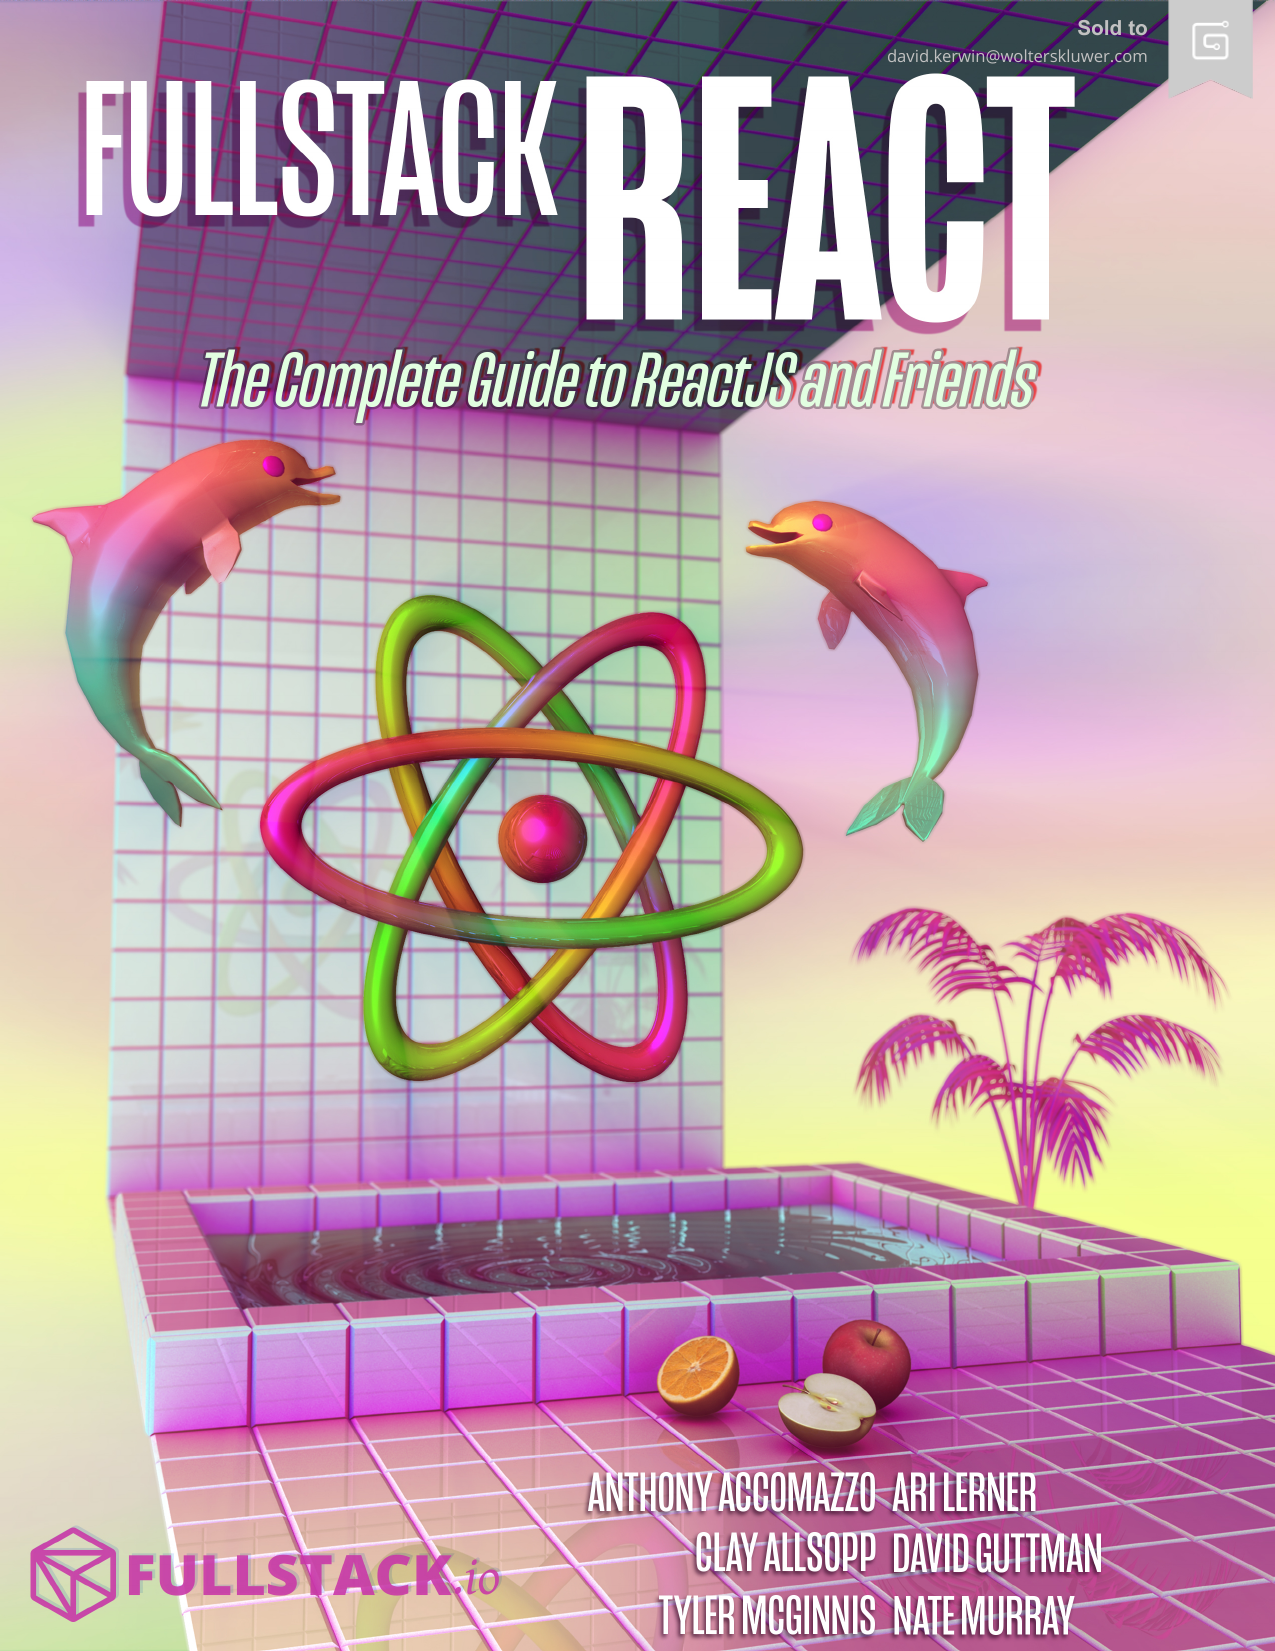 fullstack-react-book-r36